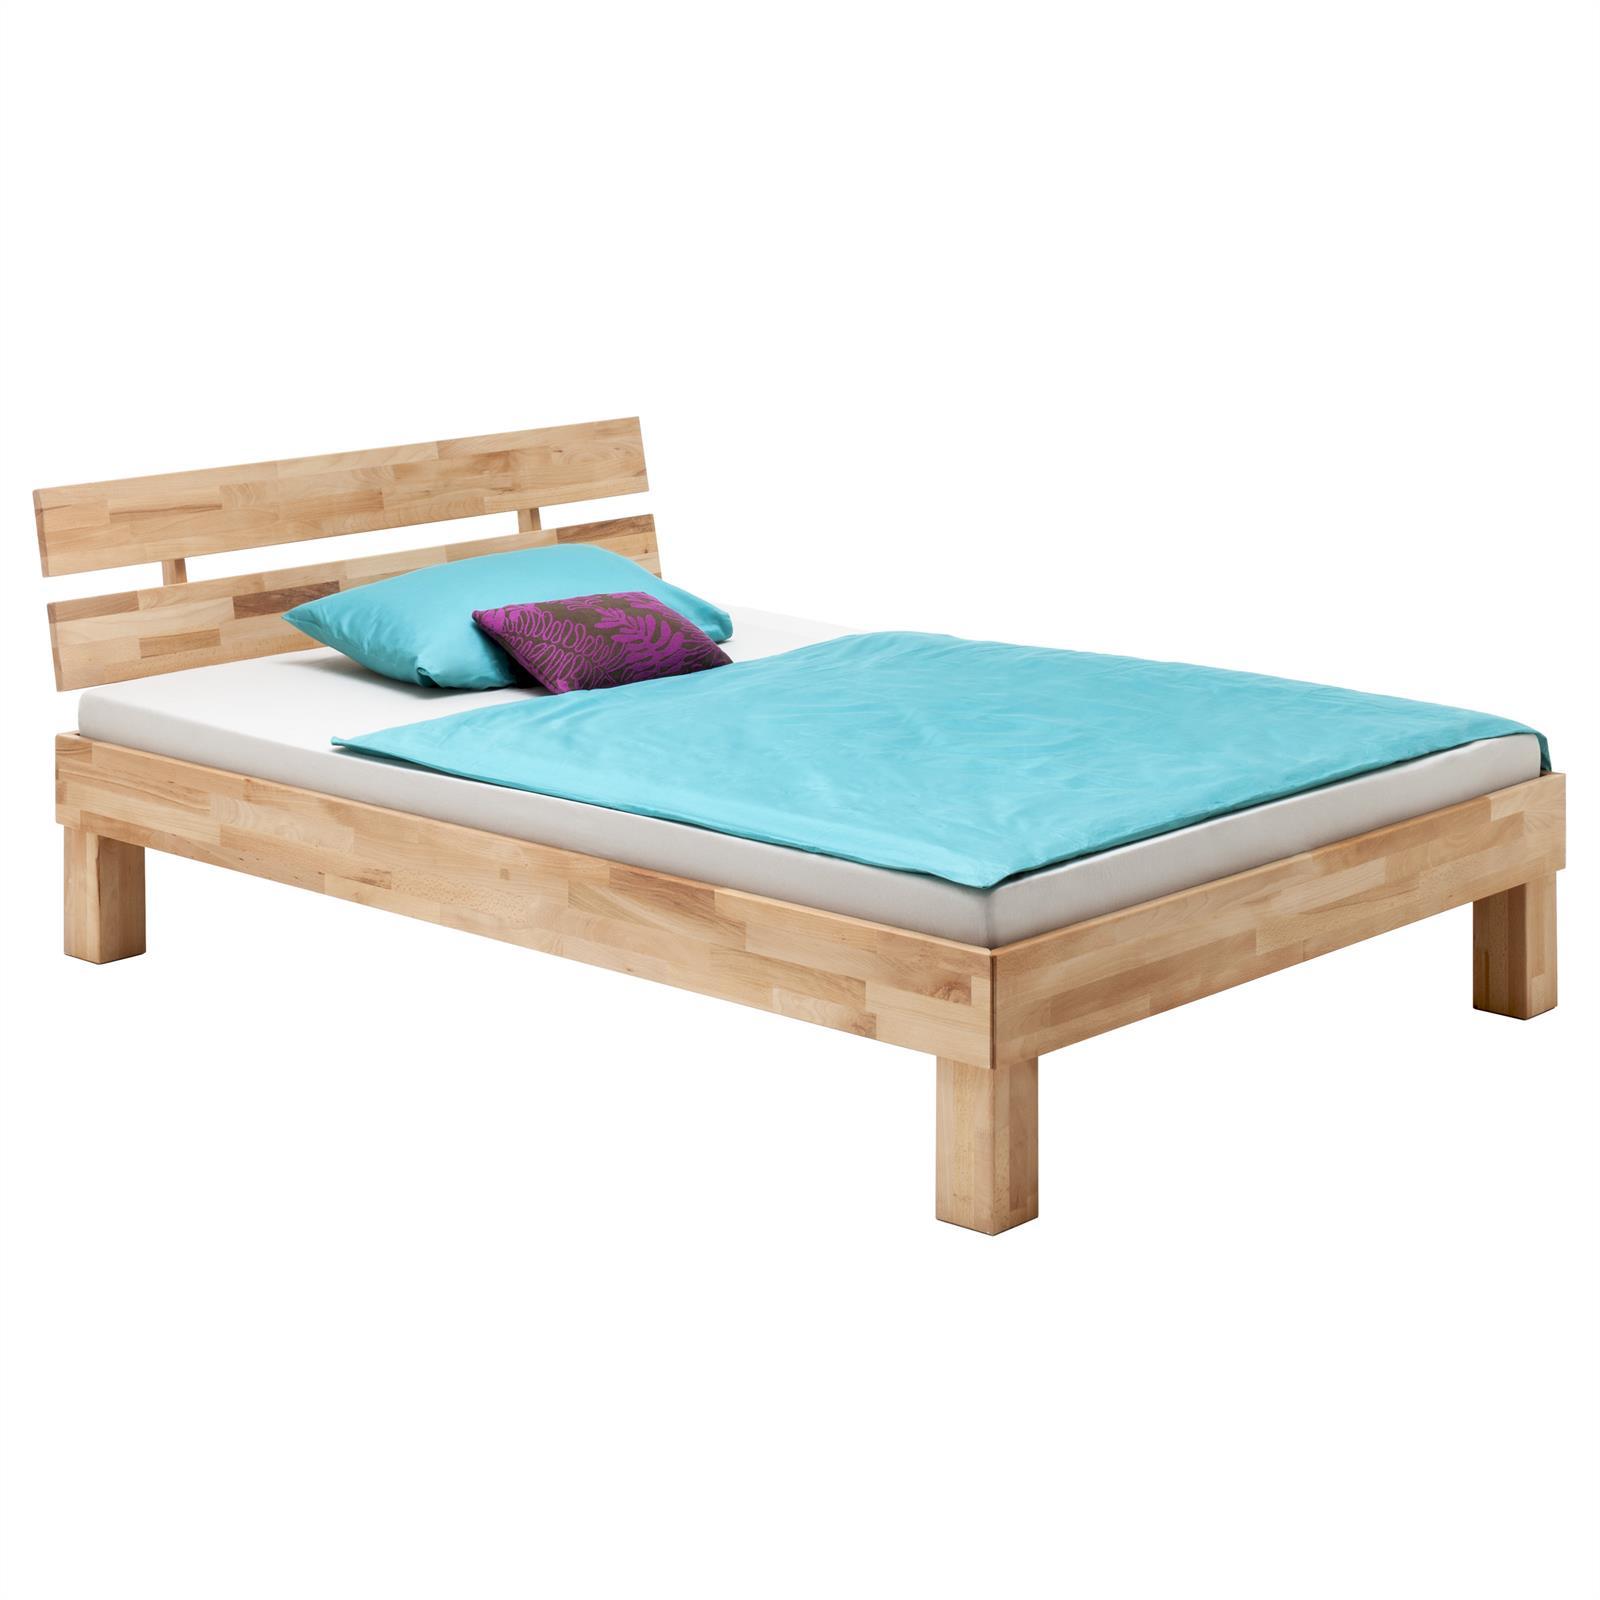 buchebett futonbett bettgestell jugendbett doppel einzel buche massivholz ge lt ebay. Black Bedroom Furniture Sets. Home Design Ideas